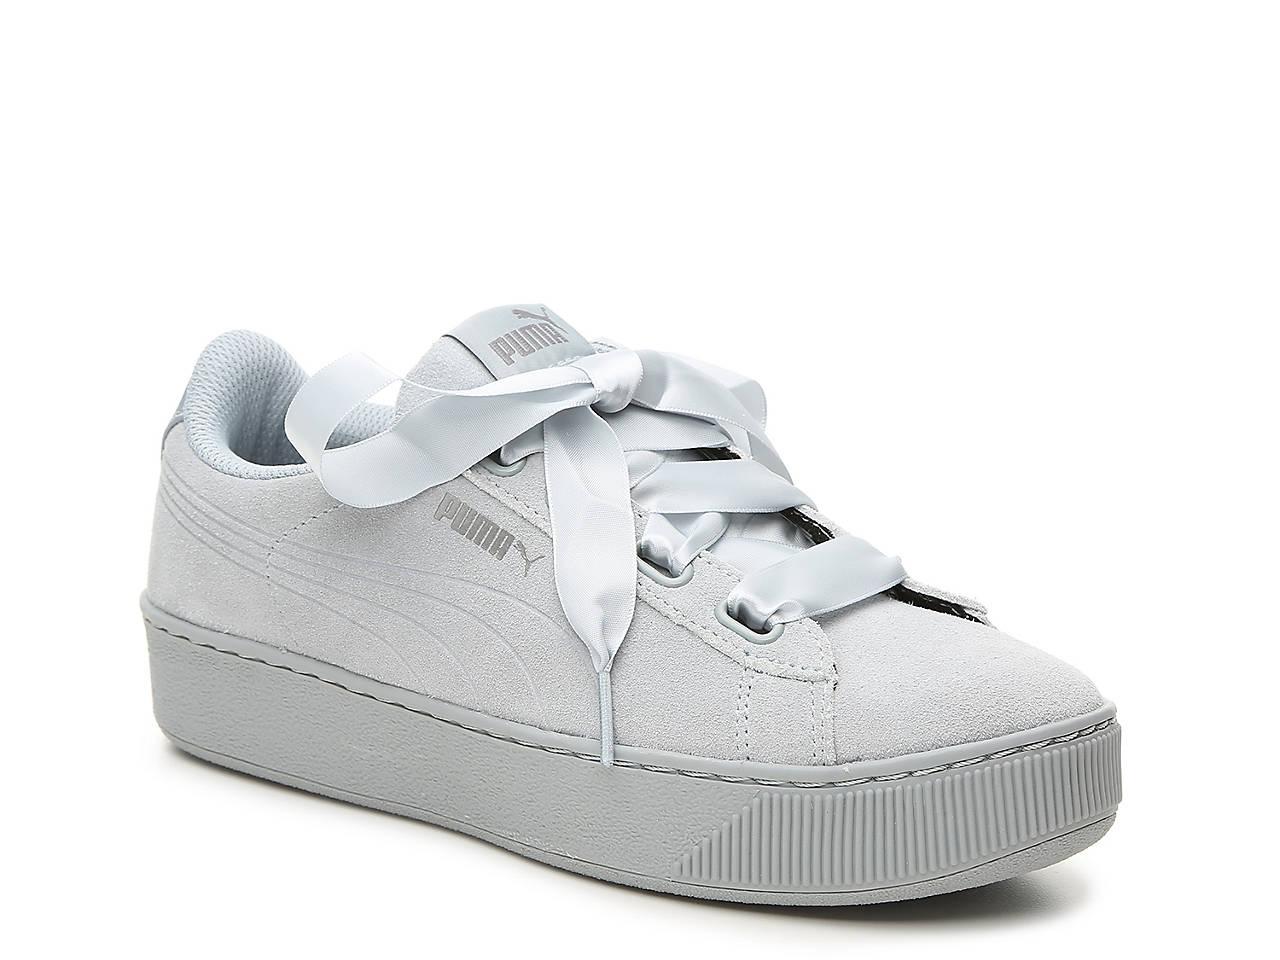 7828afa351b Puma Vikky Platform Sneaker - Women s Women s Shoes